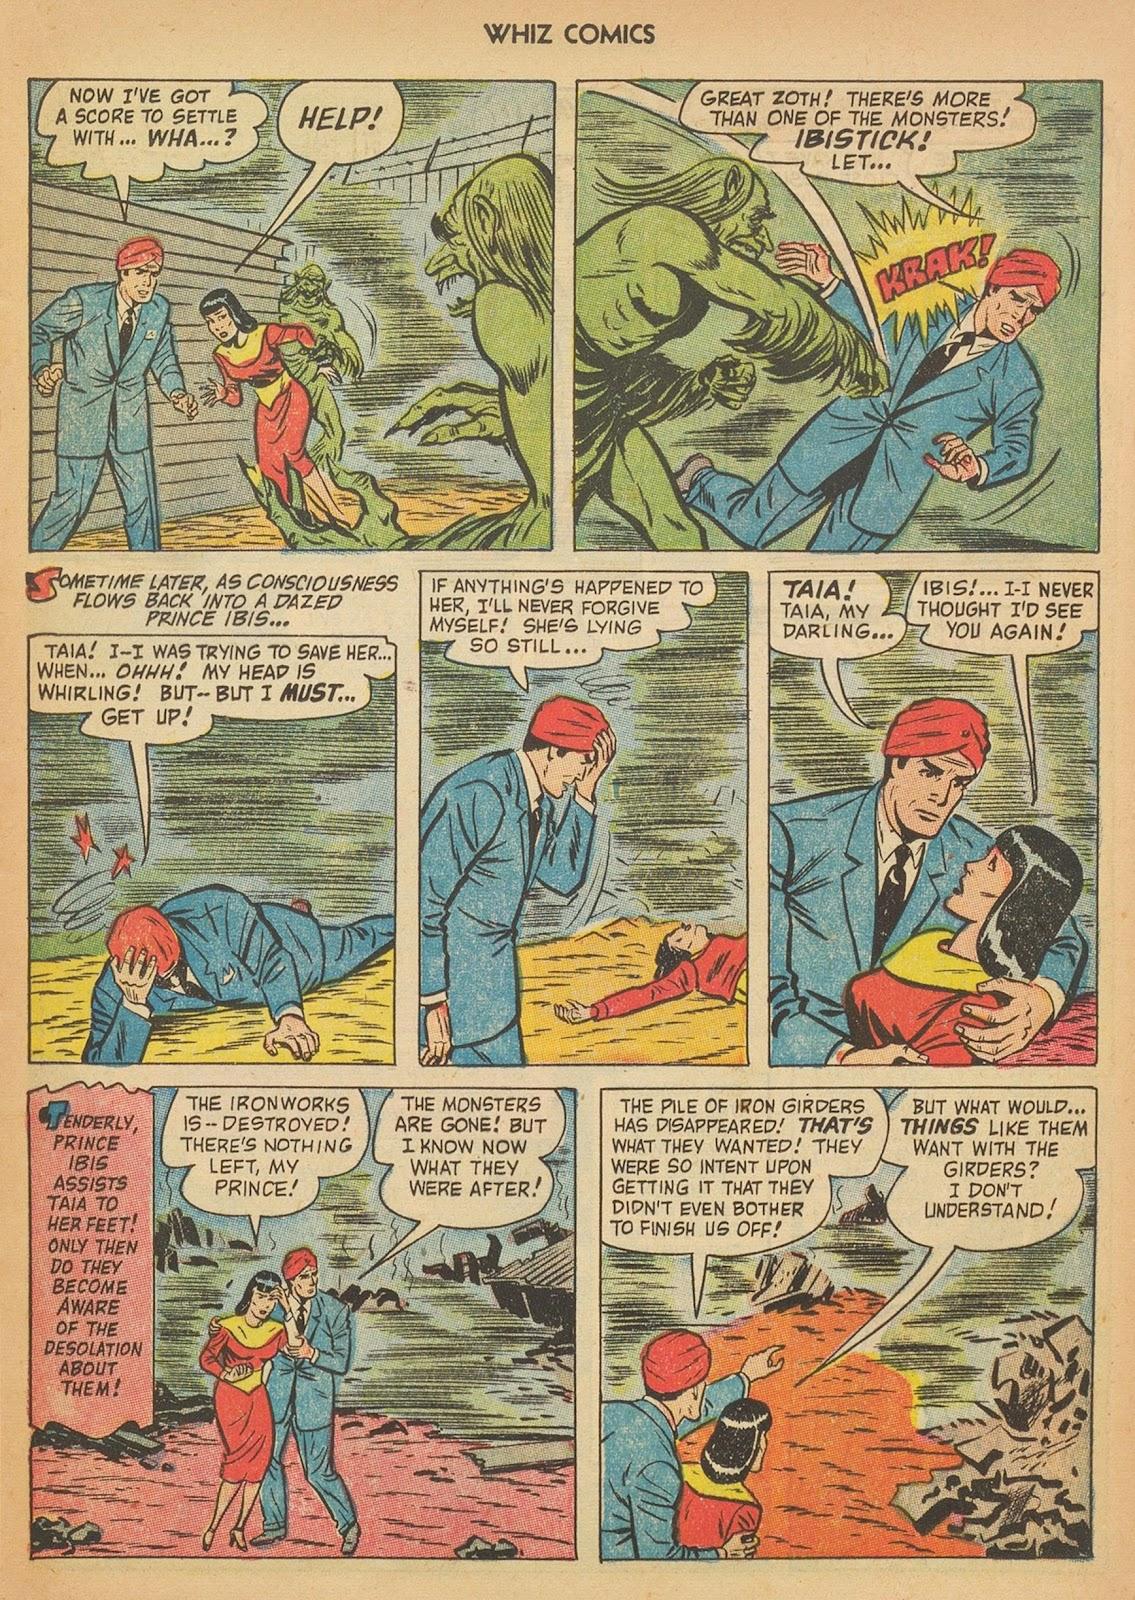 Read online WHIZ Comics comic -  Issue #153 - 13